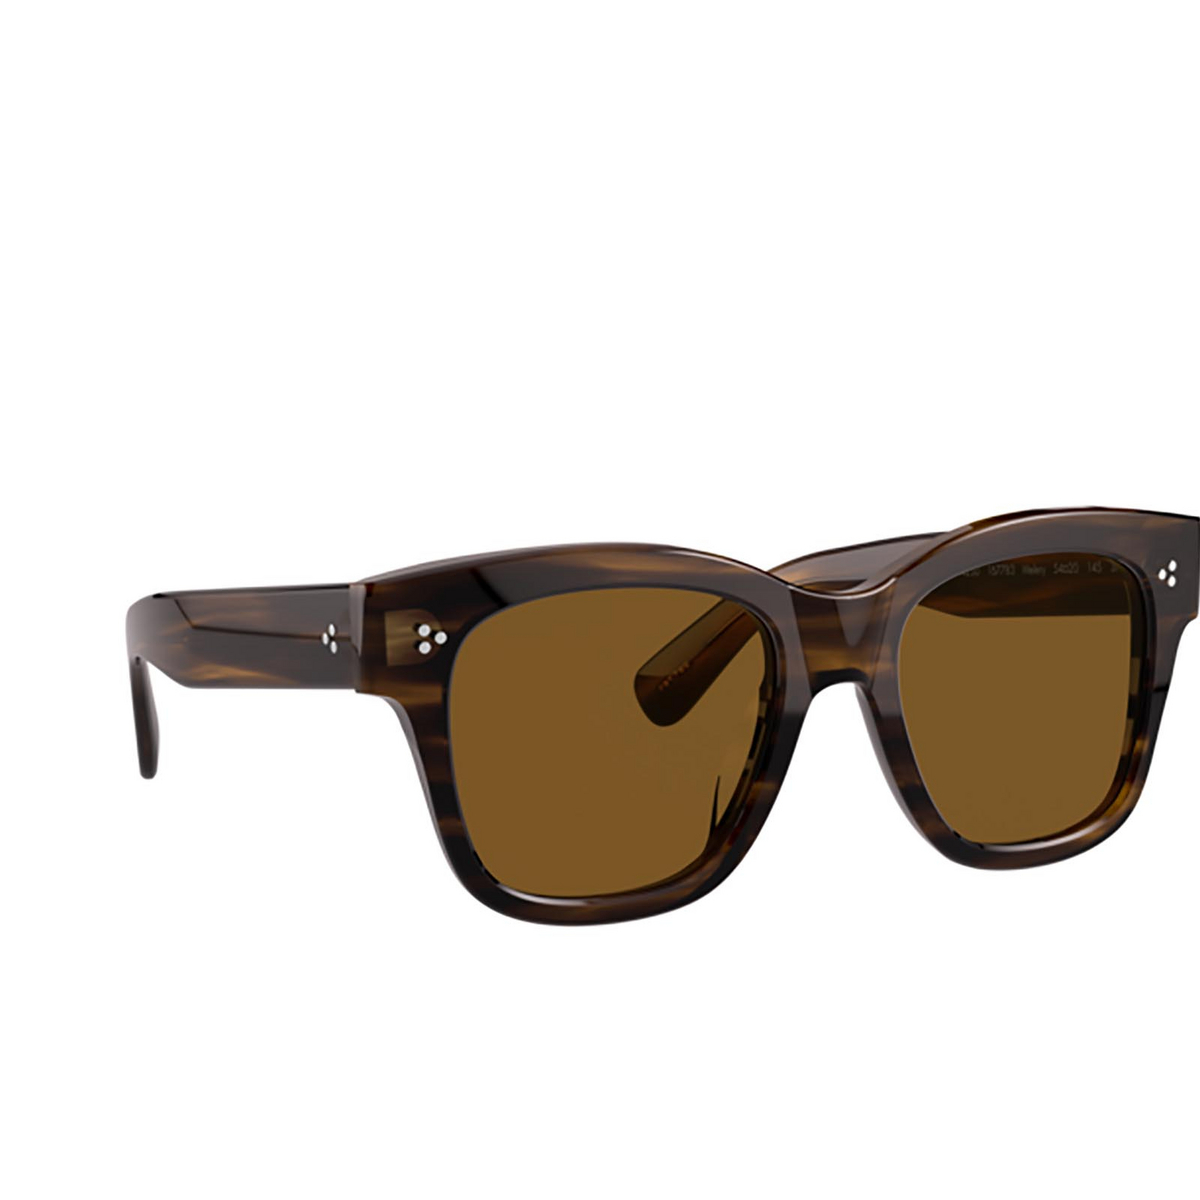 Oliver Peoples® Square Sunglasses: Melery OV5442SU color Bark 167783.